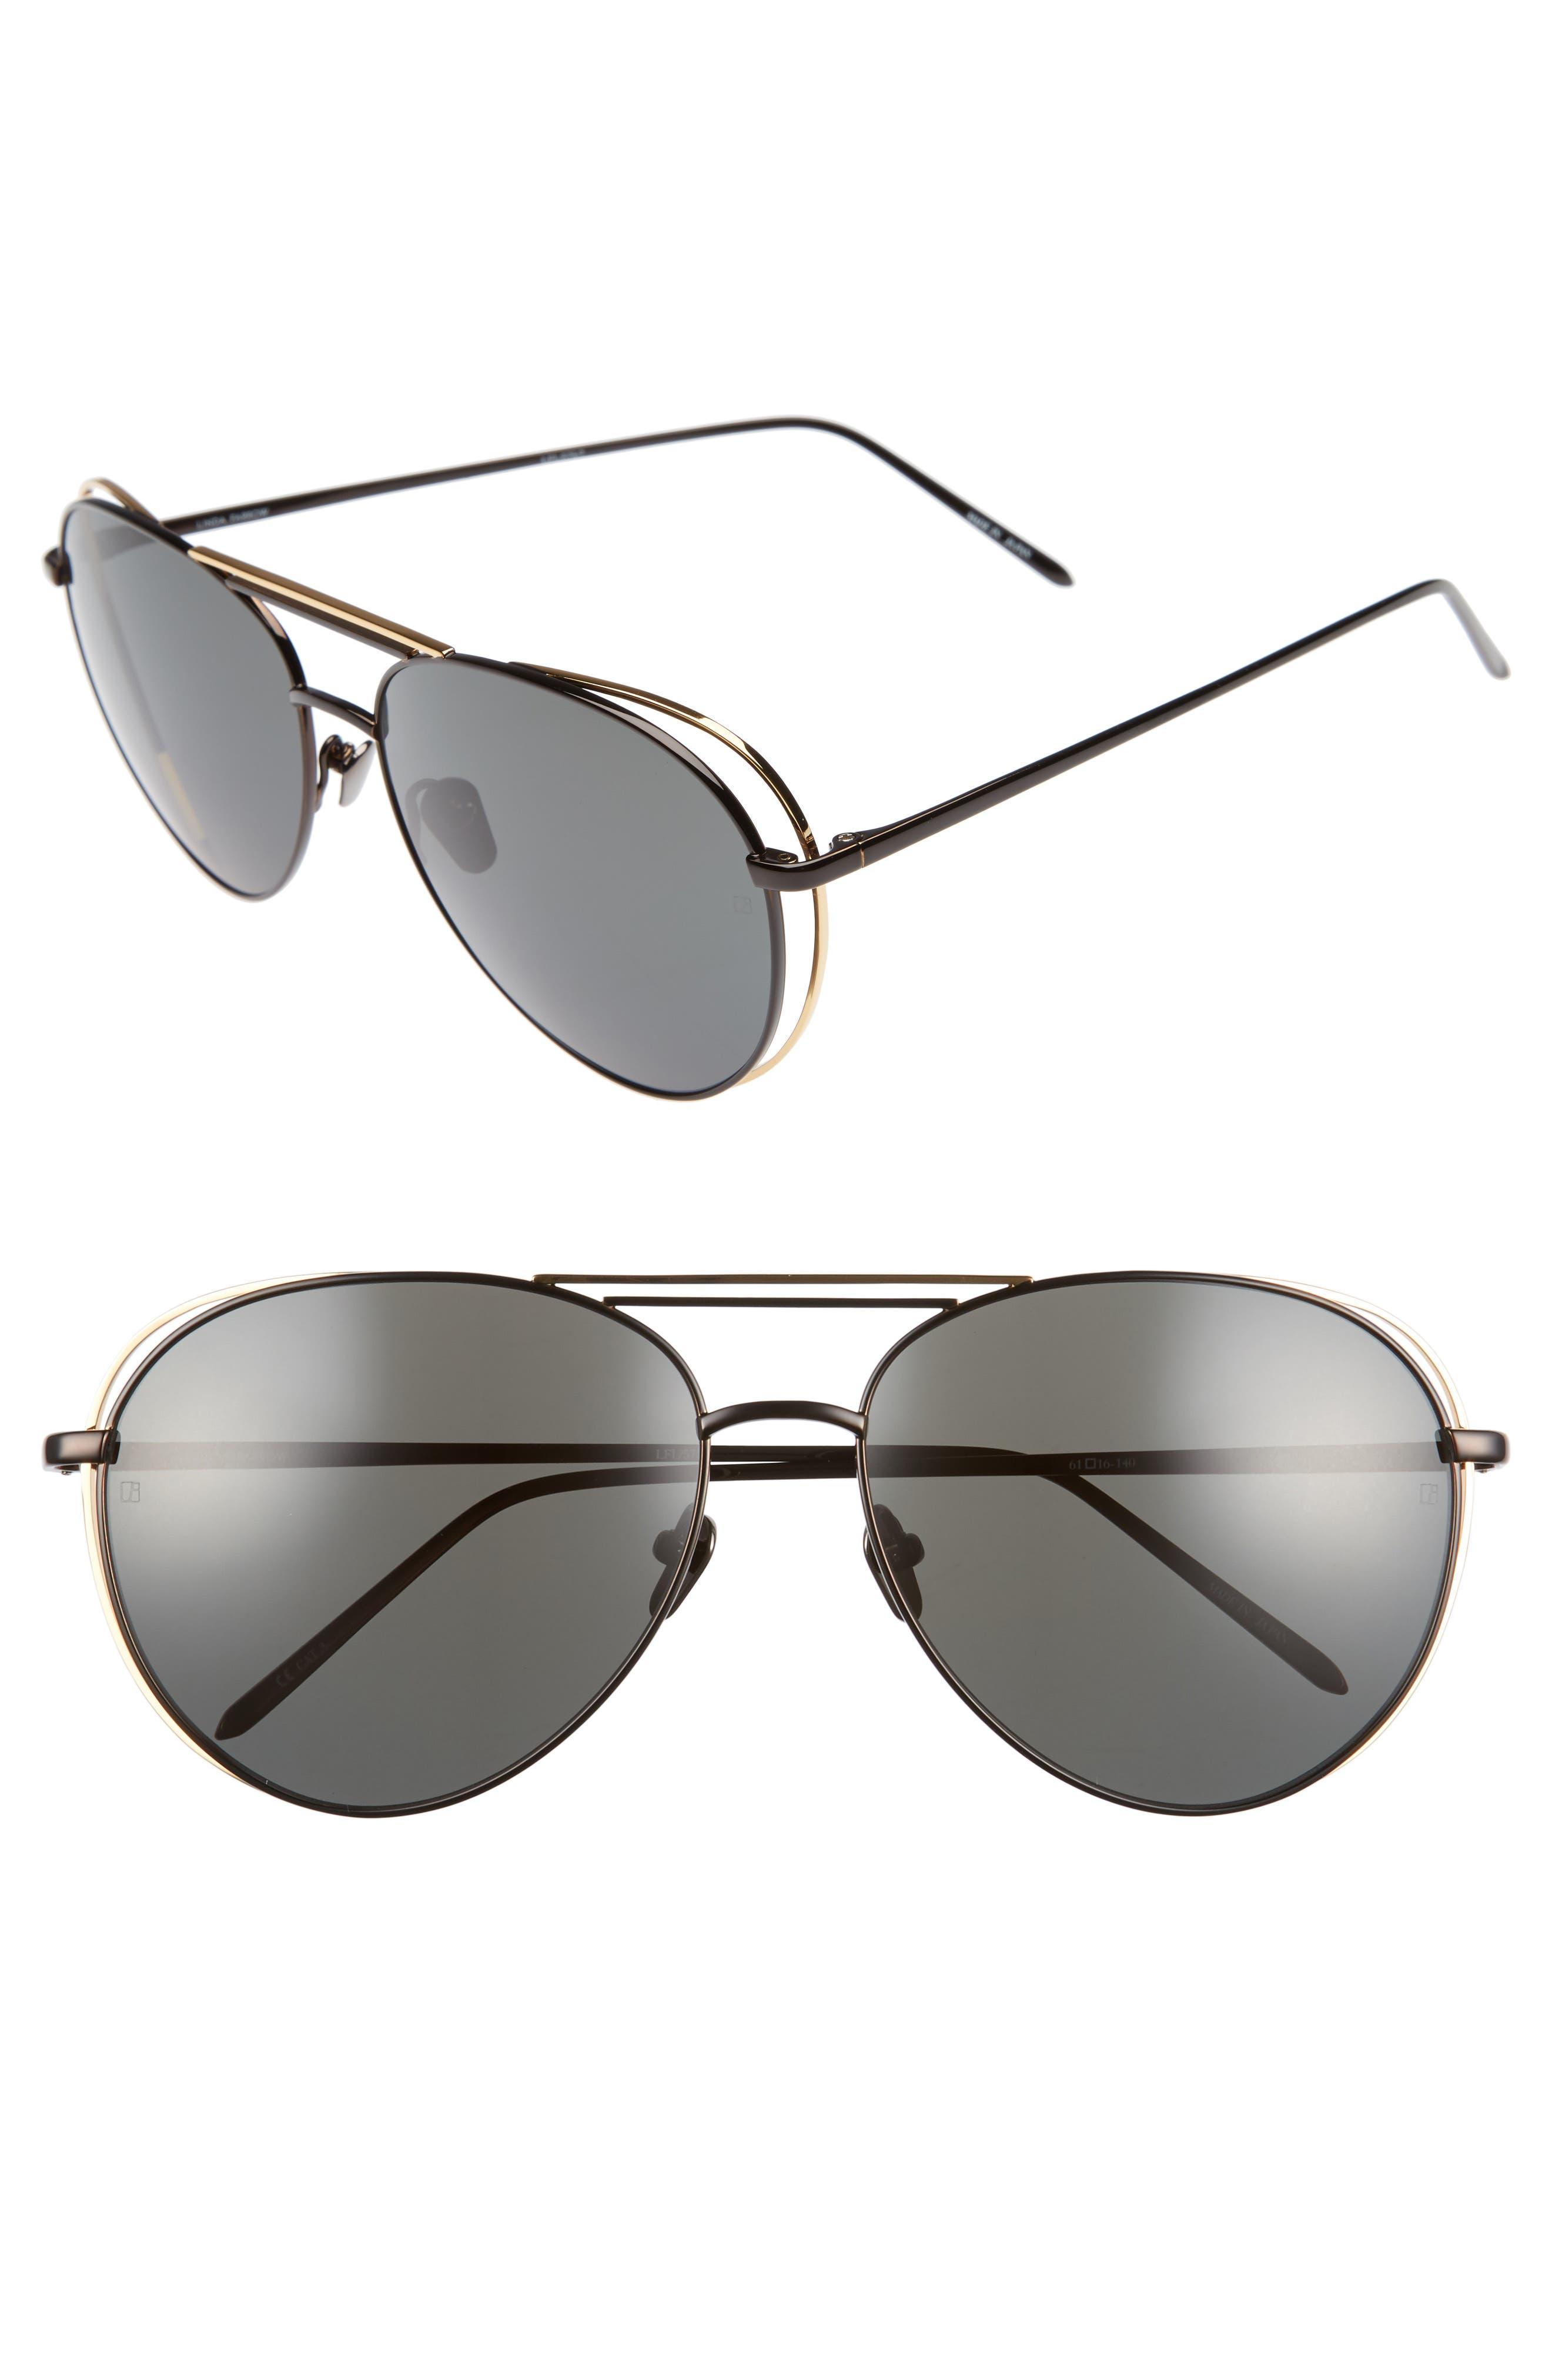 Linda Farrow 61mm 18 Karat Gold Aviator Sunglasses